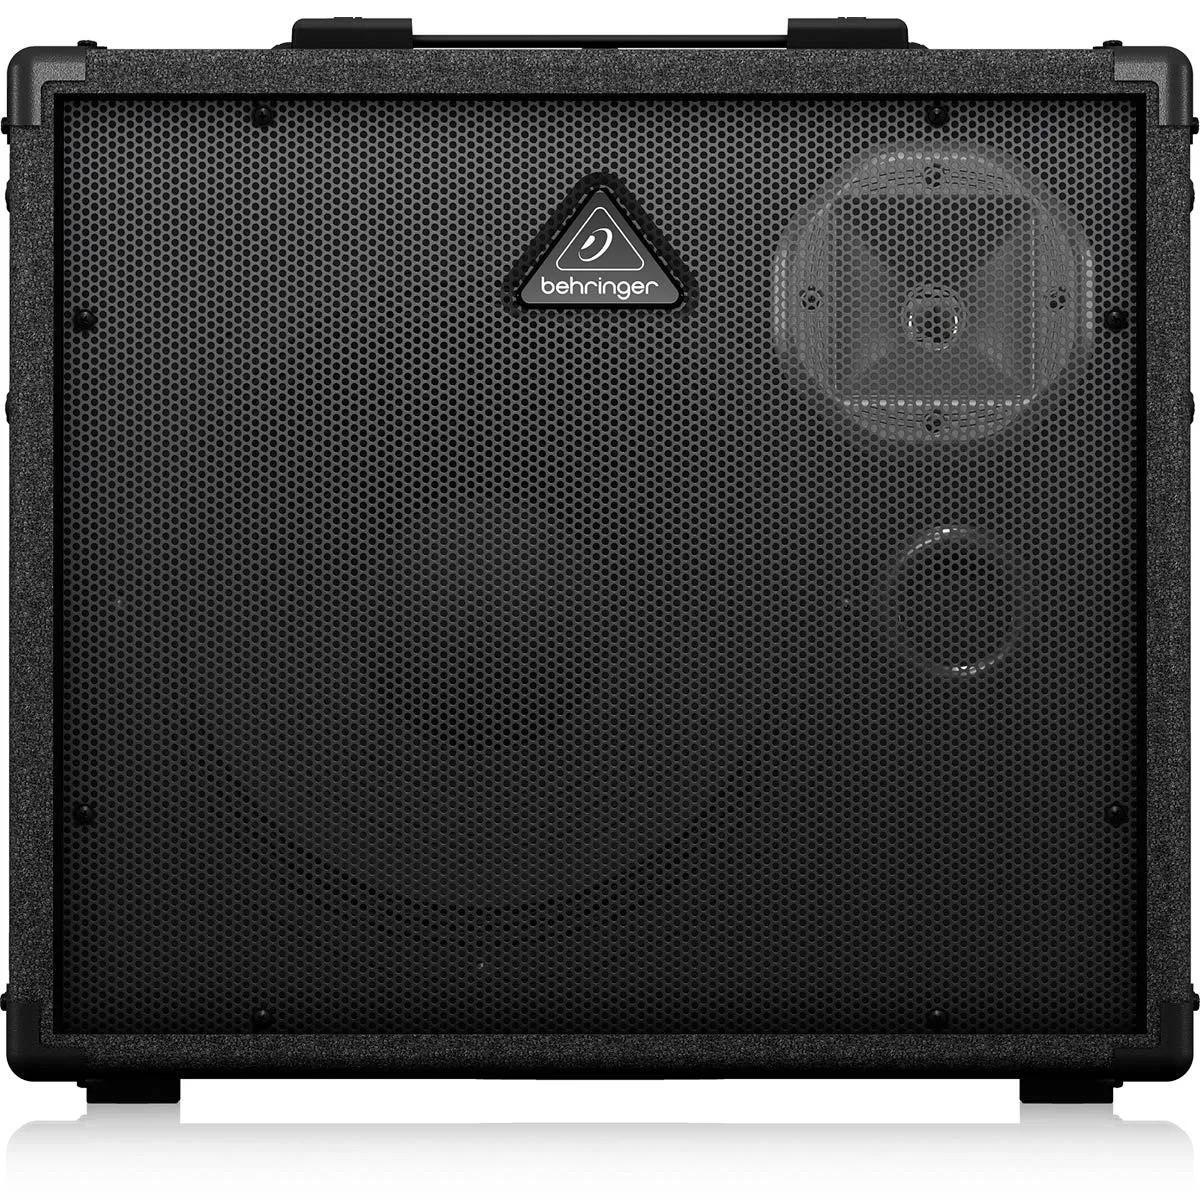 Caixa Amplificada Behringer Ultratone K900fx 90W 1x12